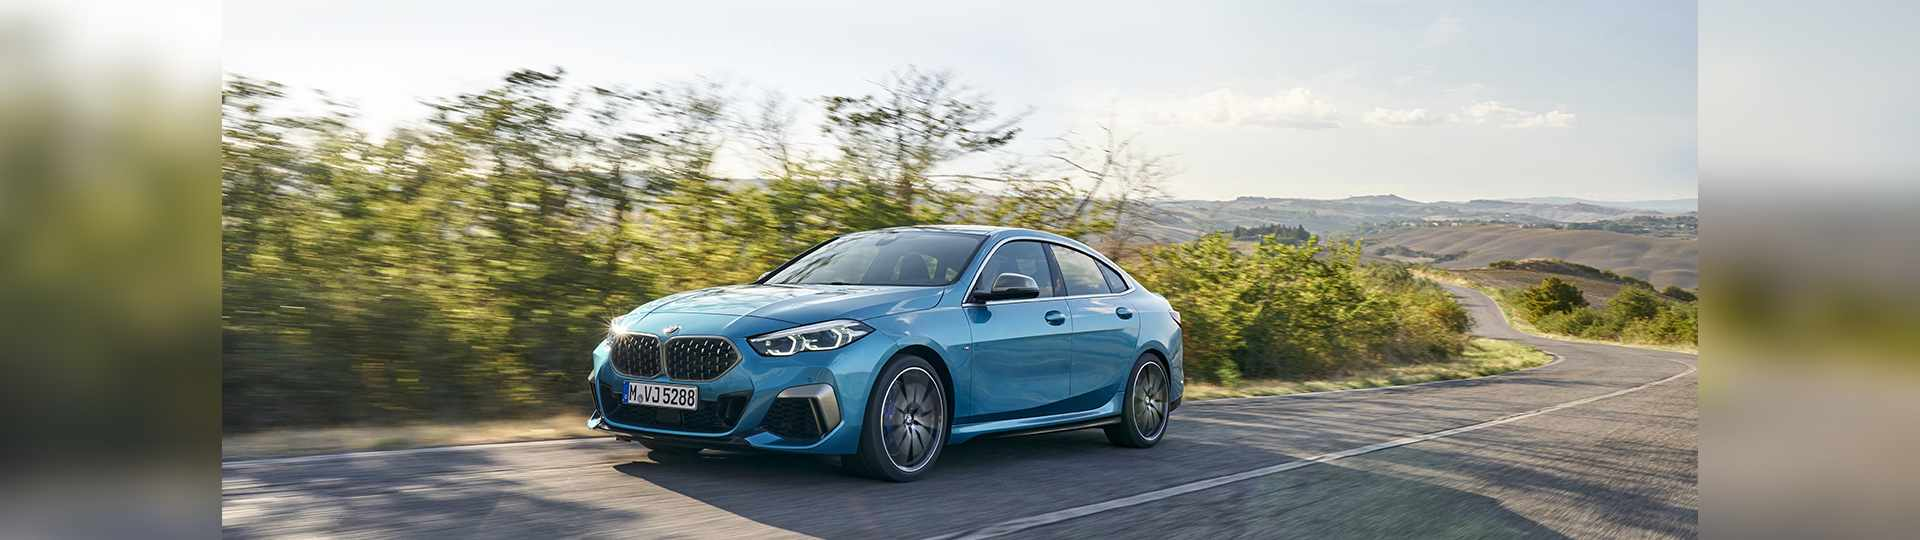 BMW Serie2 Gran Coupè_gennaio2020.jpg